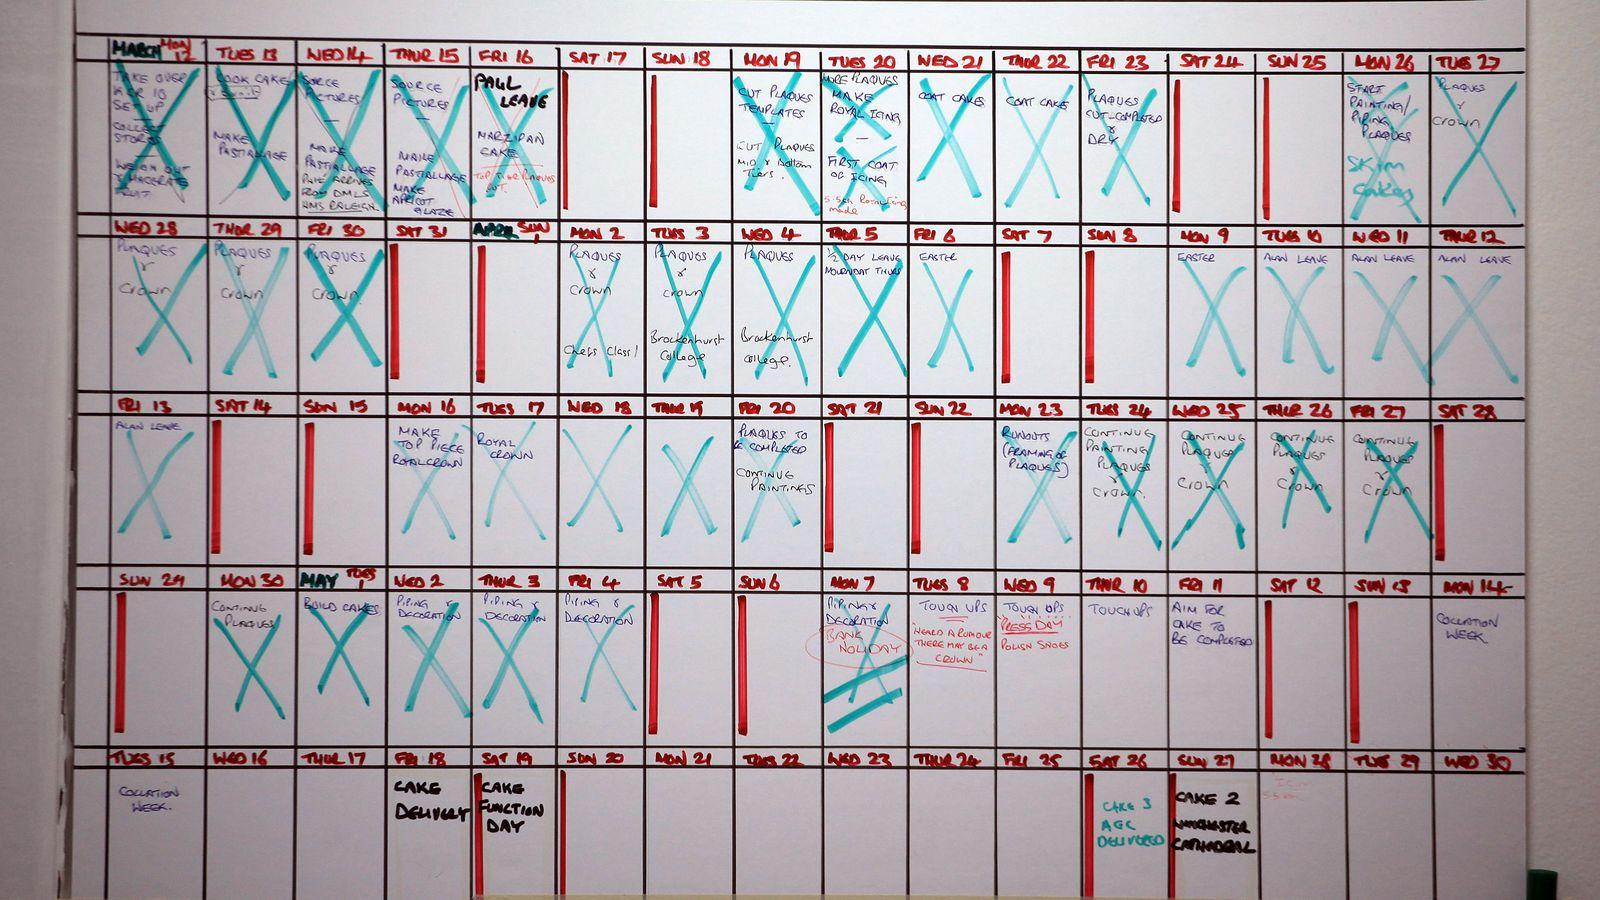 Nfl roster cuts dates